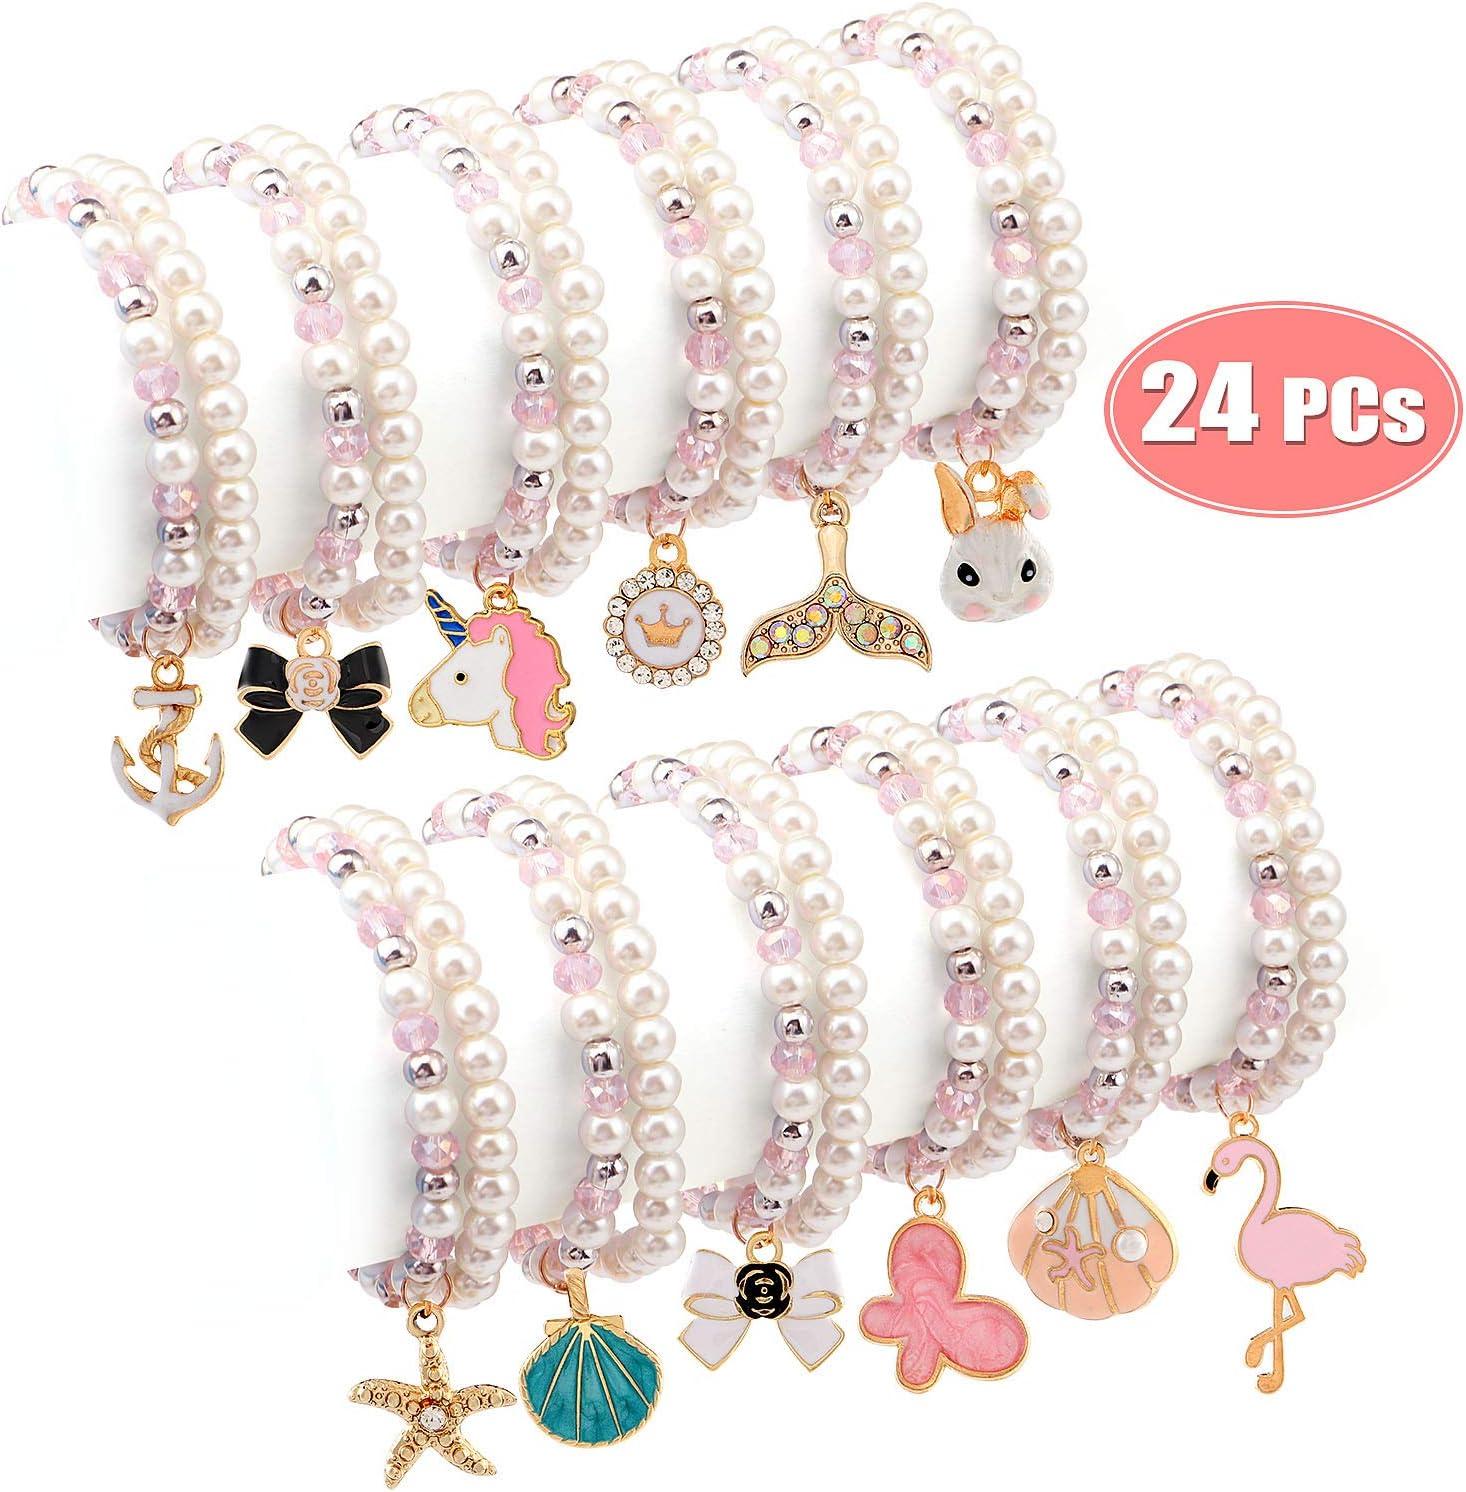 Bracelets for Teen Girls Tucson Mall Pearl Pink Penda Beaded Animals Unicorn Max 82% OFF